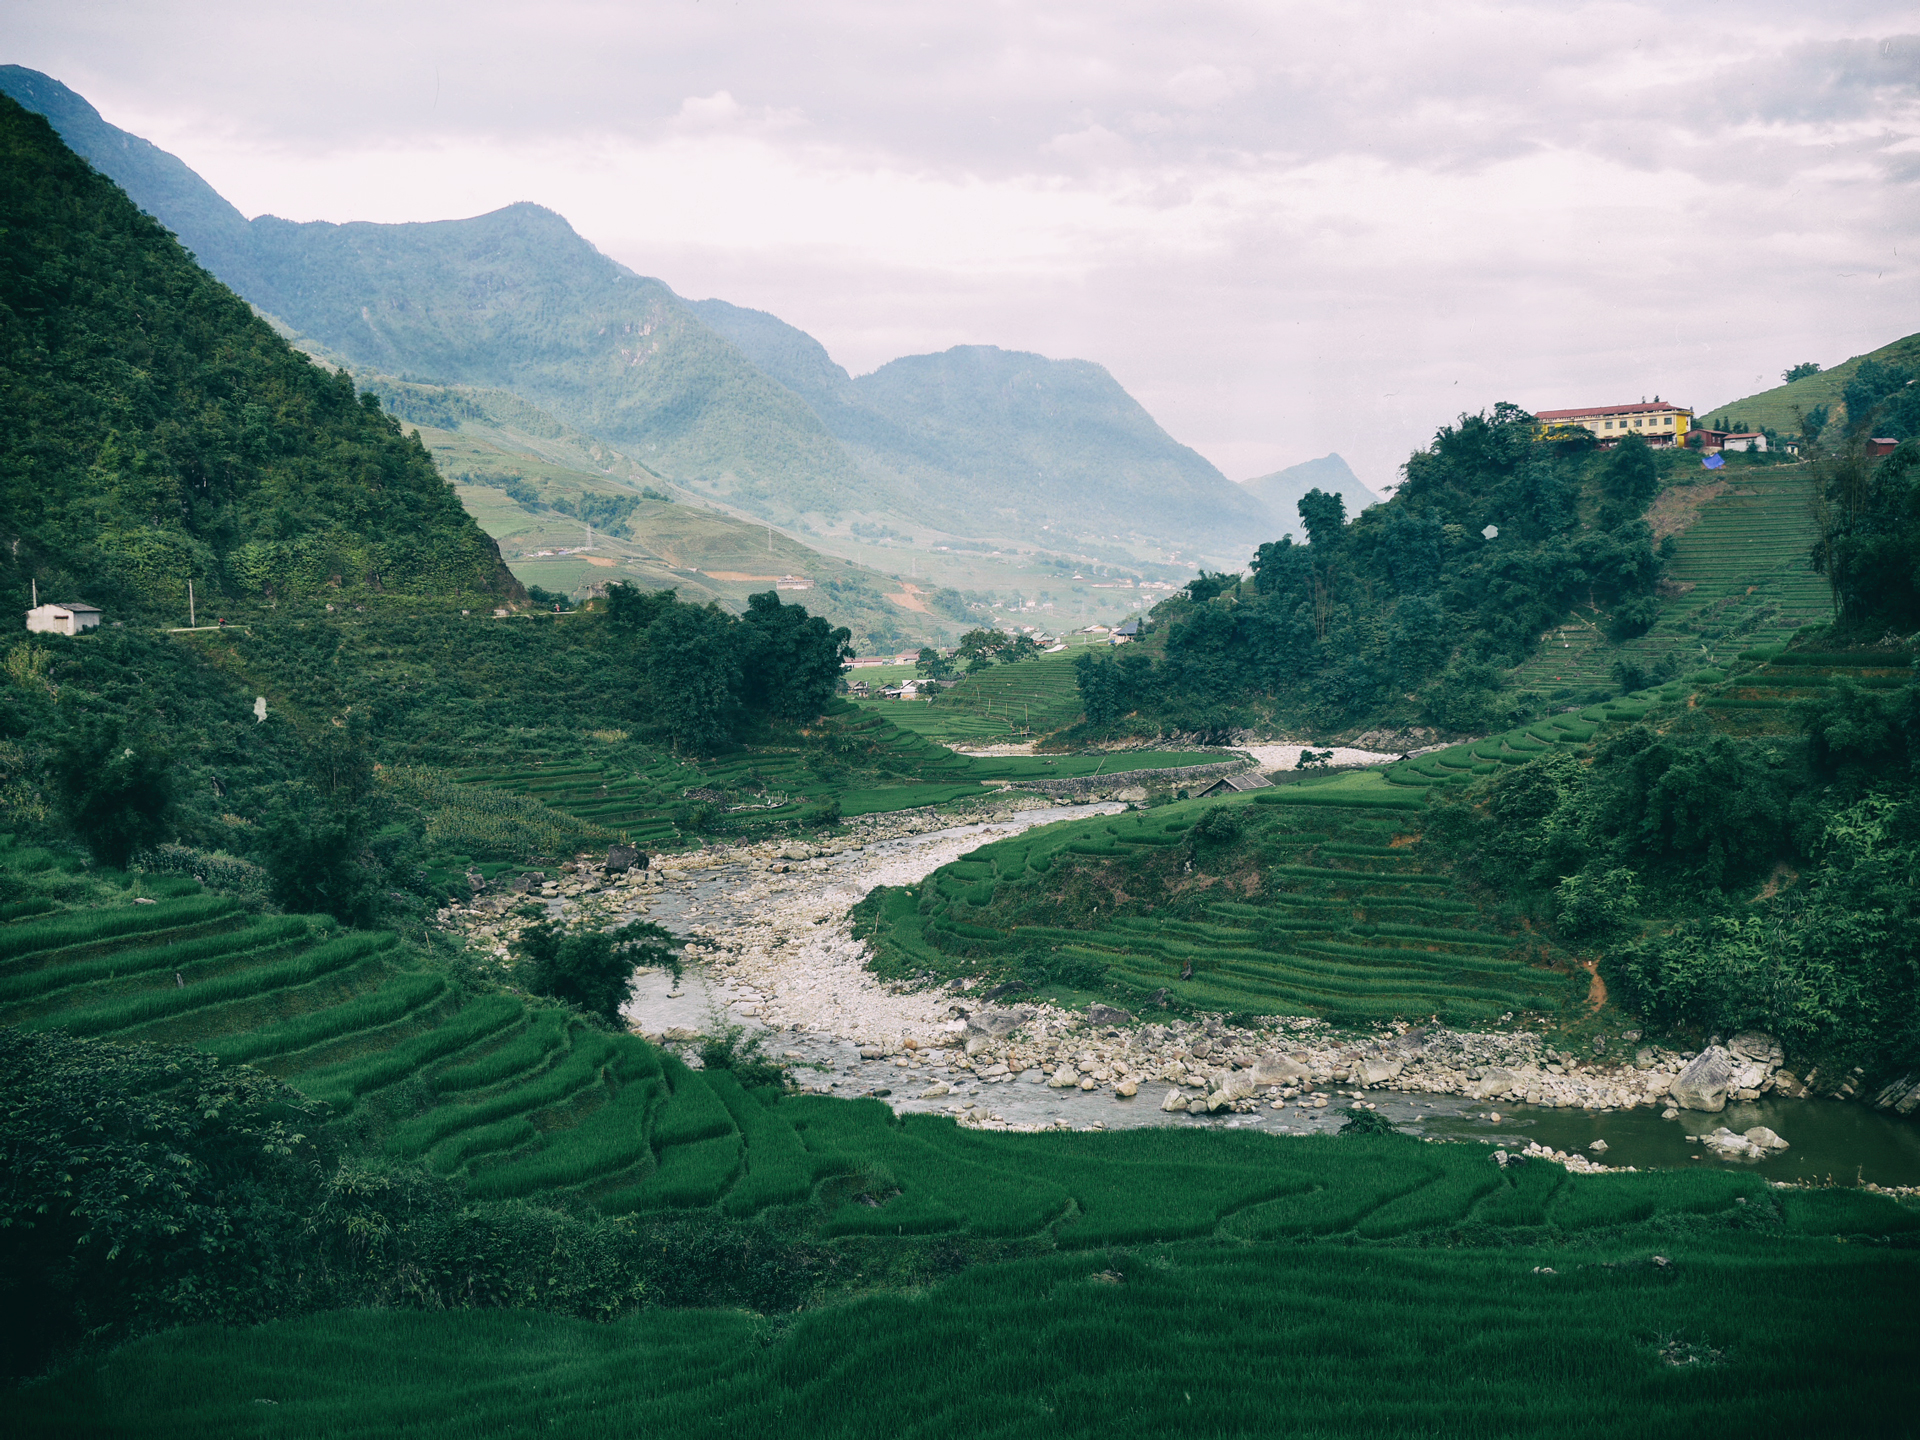 Hmong-mountain,-rice-paddy-fields